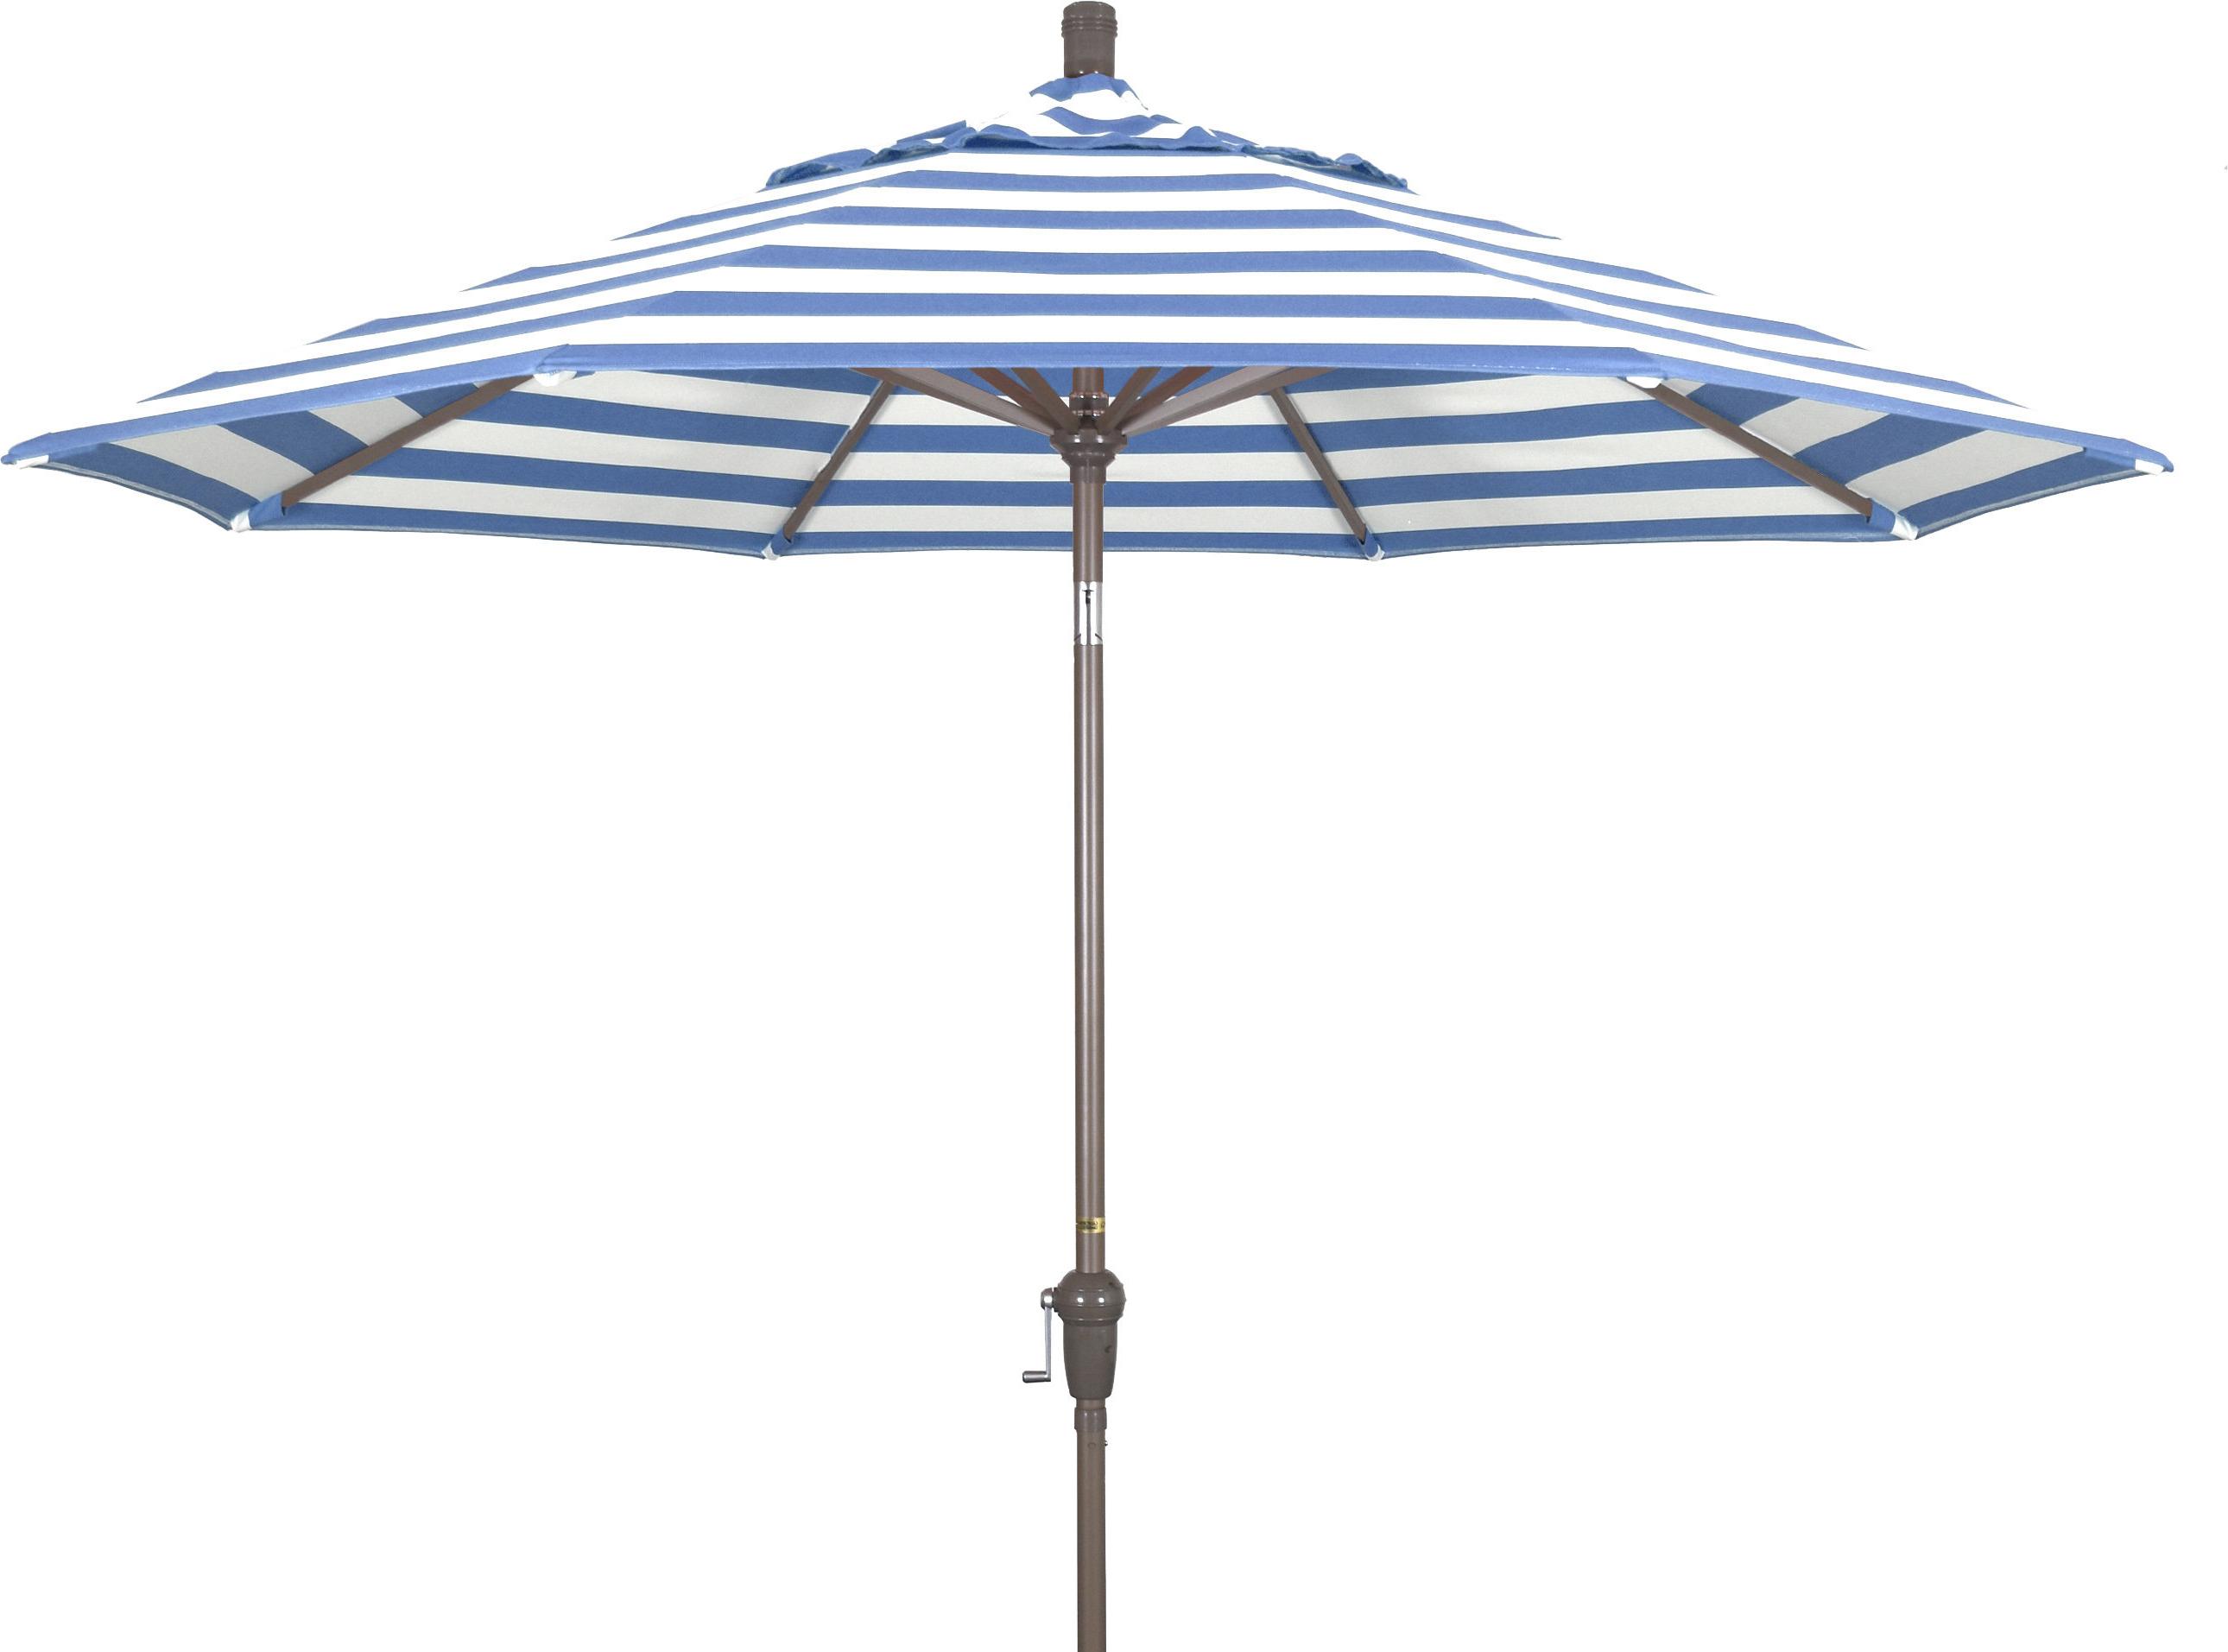 Caravelle Market Sunbrella Umbrellas Intended For 2019 9' Market Sunbrella Umbrella (View 7 of 20)